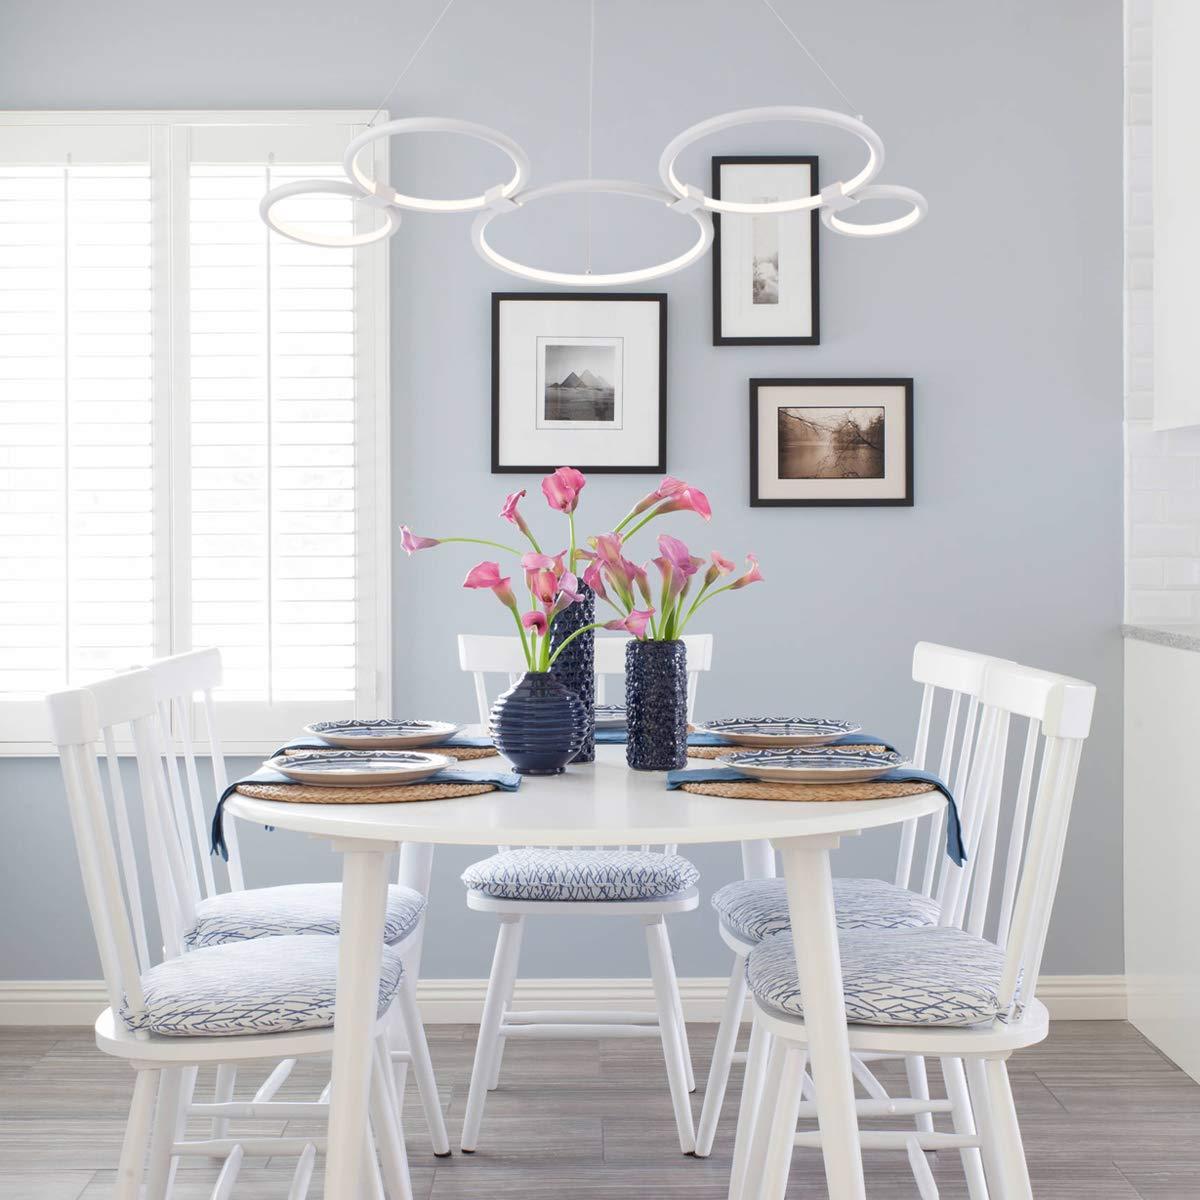 Amazon.com: Moderna lámpara de araña circular LED simple ...